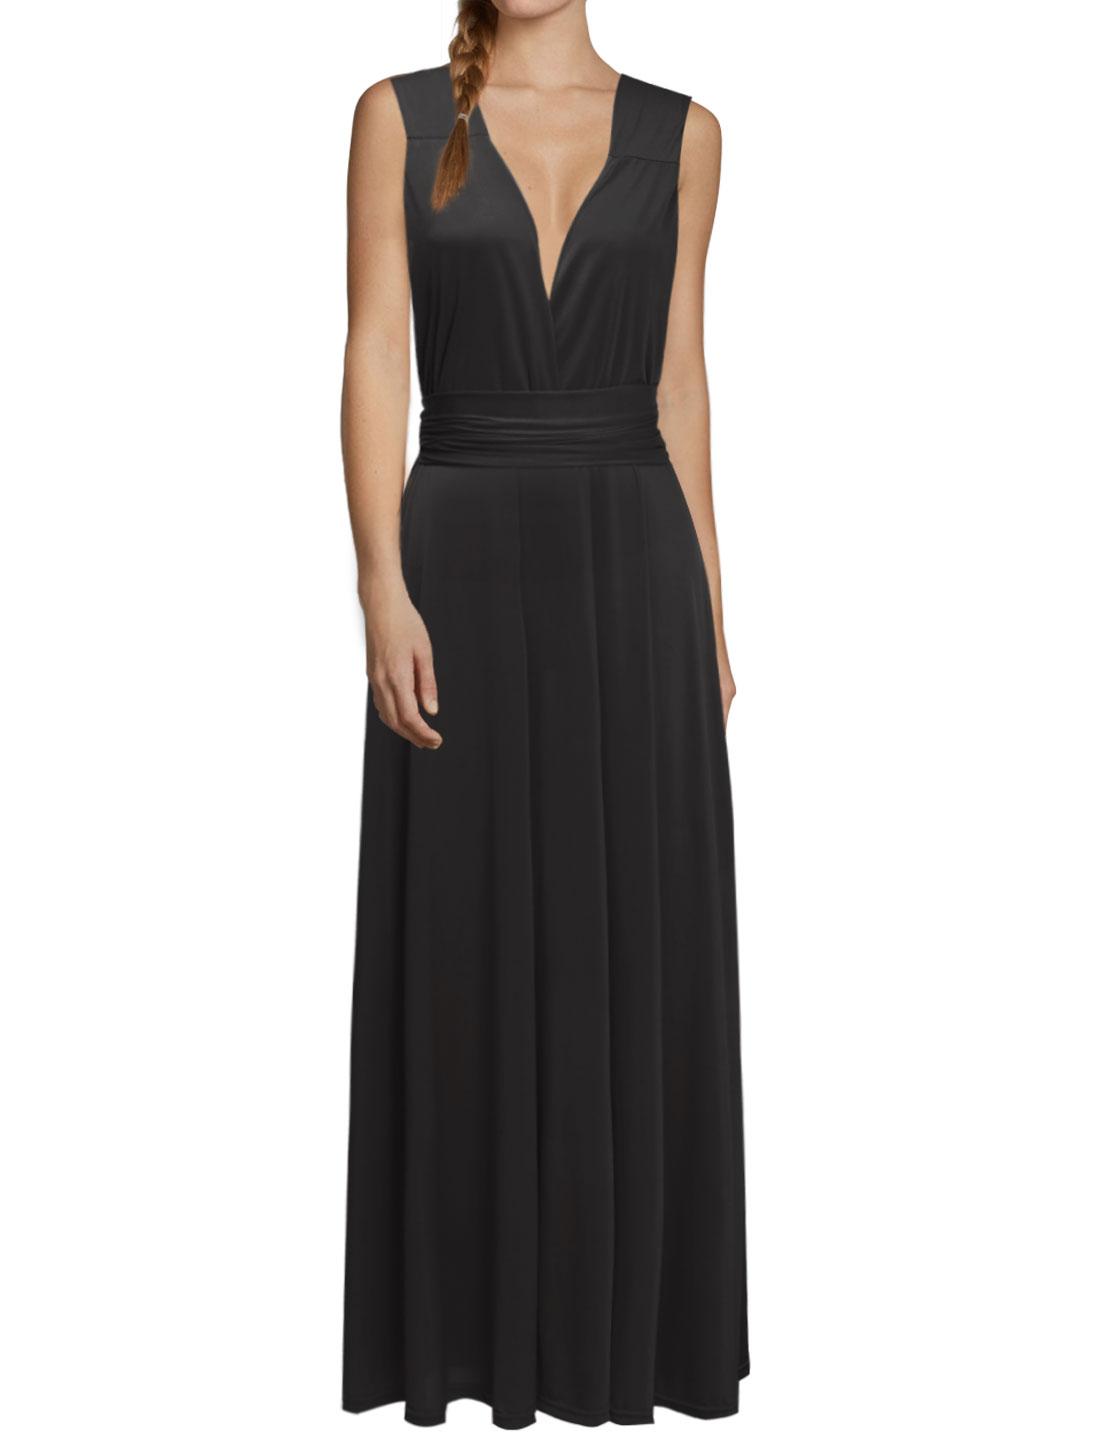 Women Crossover V Neck Self-Tie Multi-Way Wearing Maxi Dress Black S